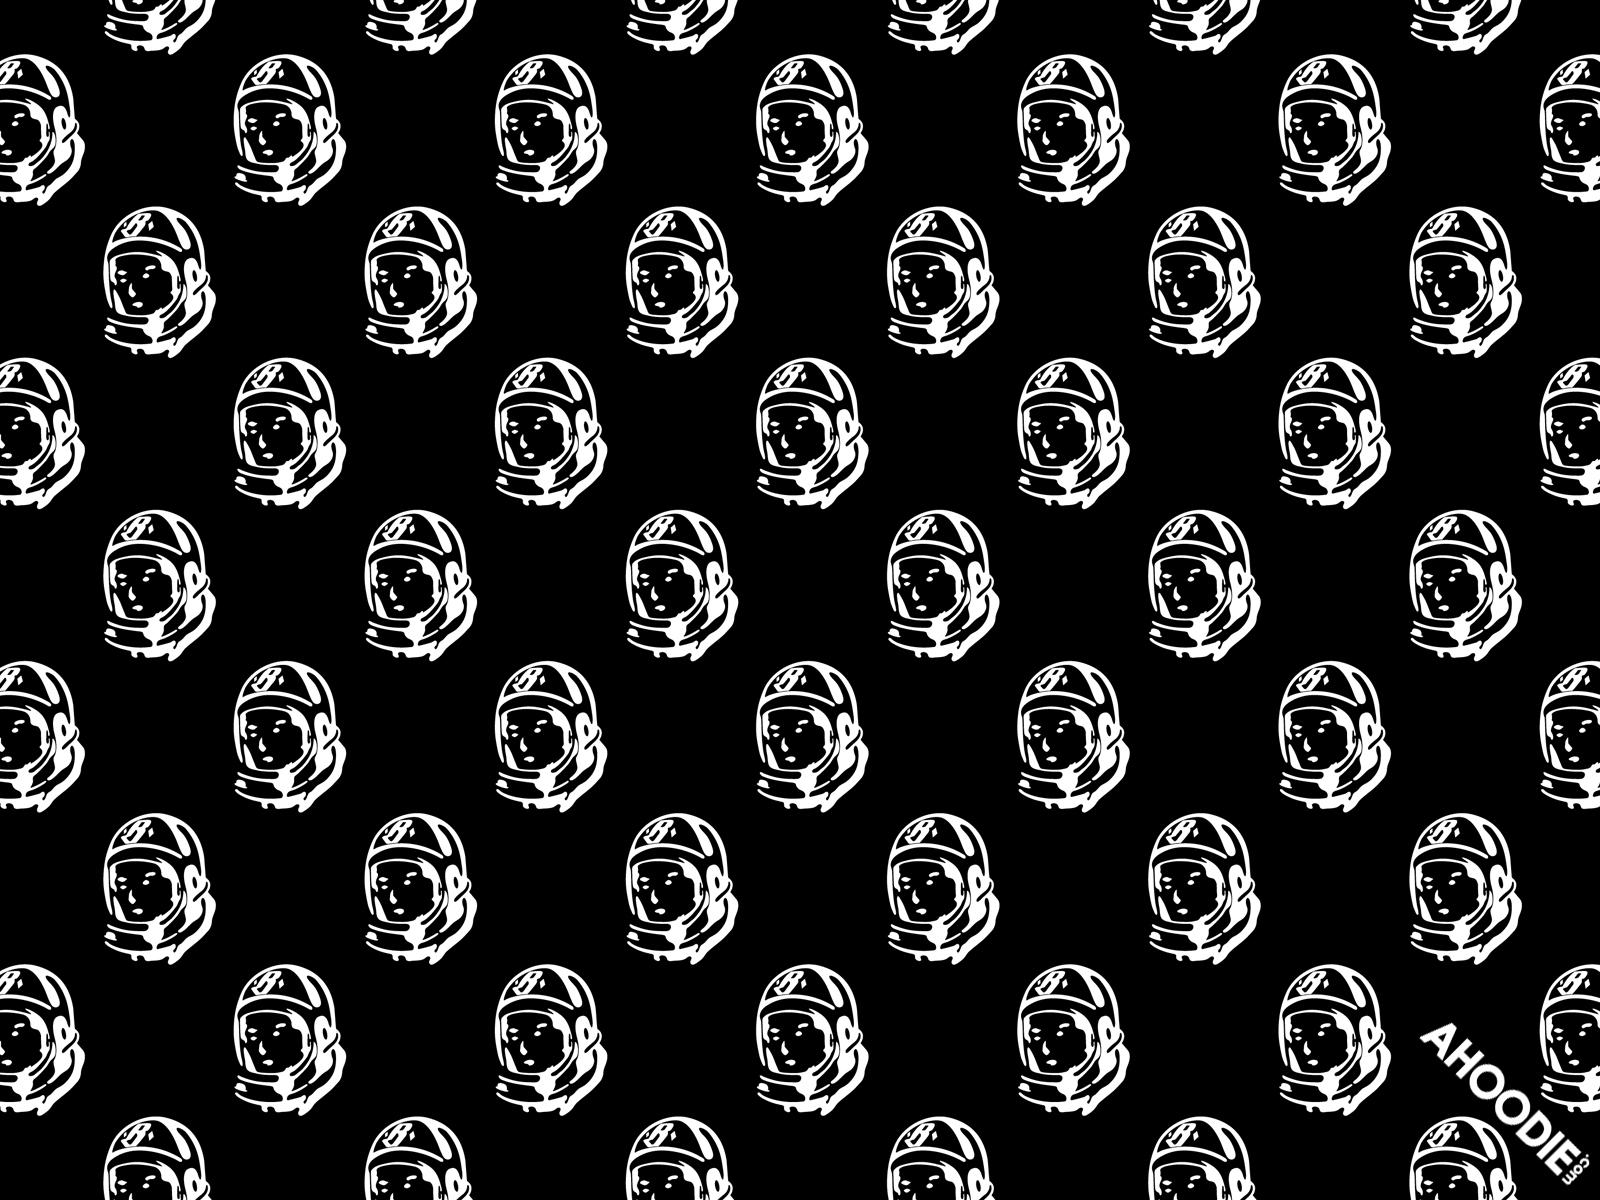 Hypebeast Wallpaper 1600x1200